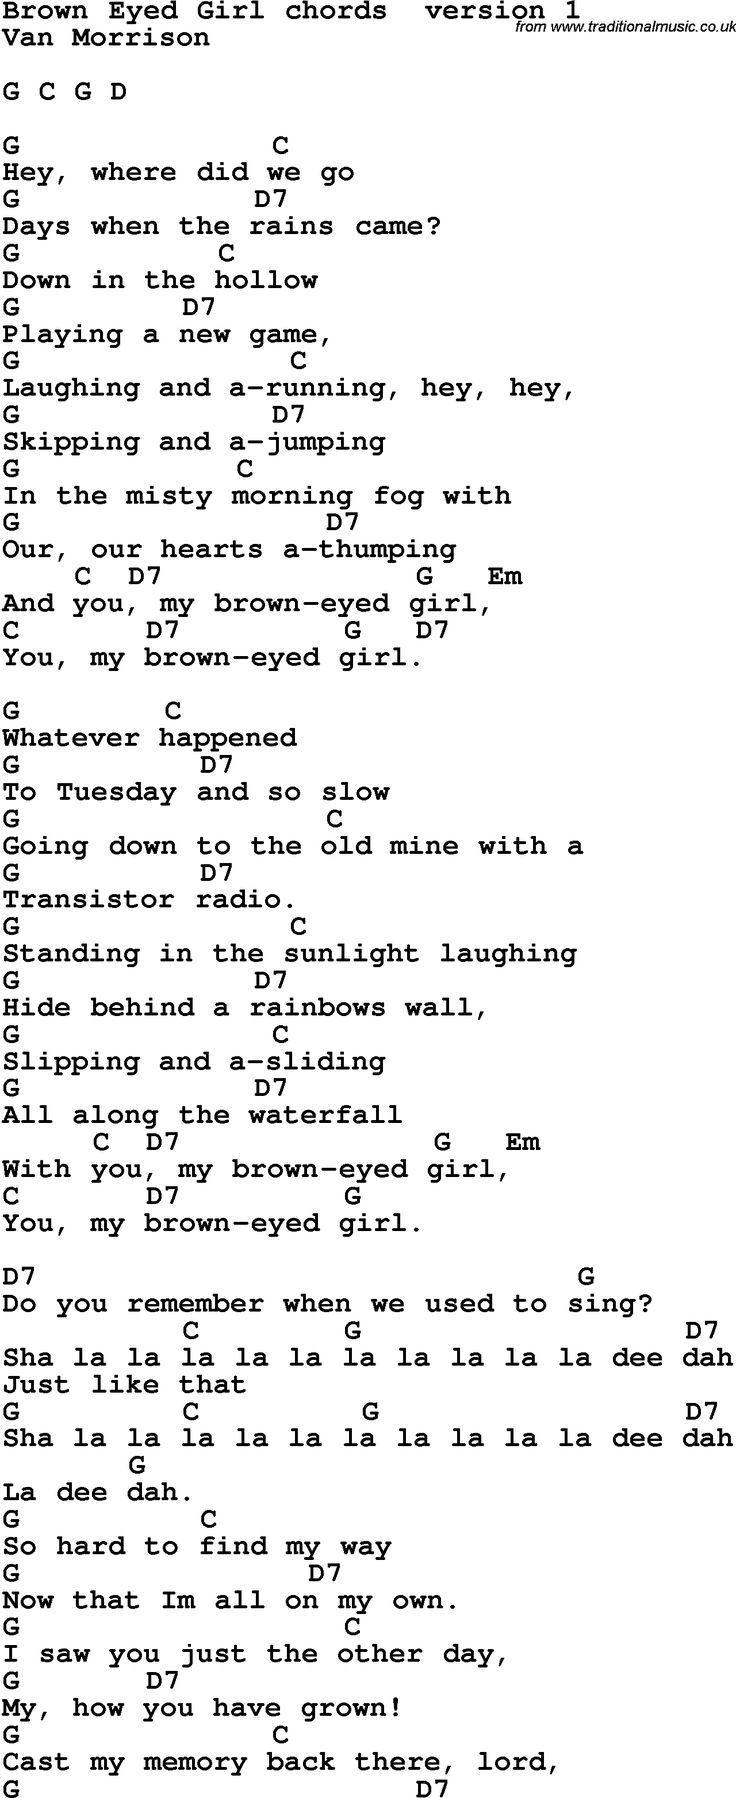 Song lyrics with guitar chords for brown eyed girl music song lyrics with guitar chords for brown eyed girl ukulele chordsmusic chordsguitar chords beginner hexwebz Gallery